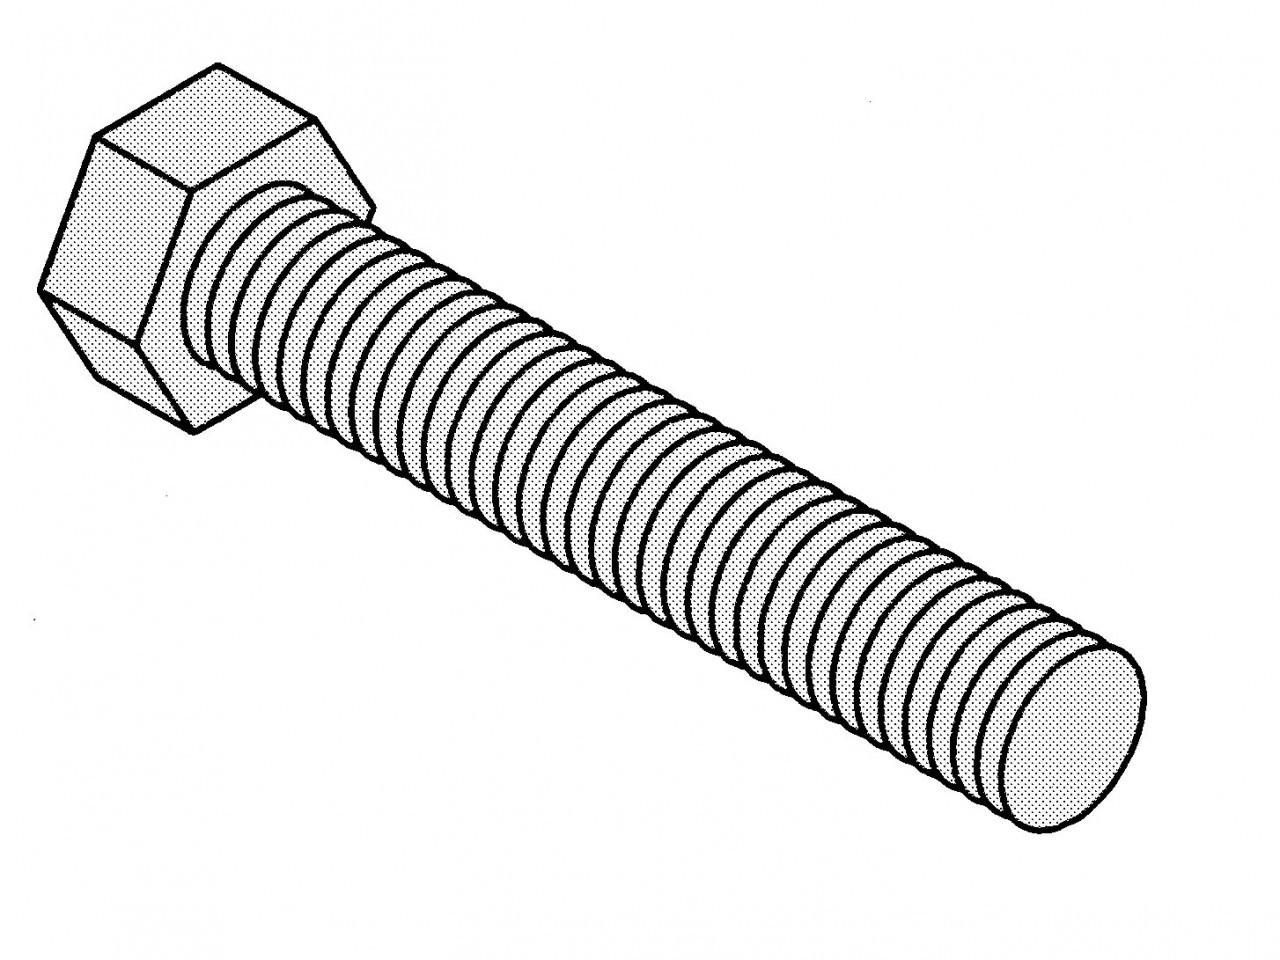 Biro Saws - Finger Lift Fastener Bolt - B157